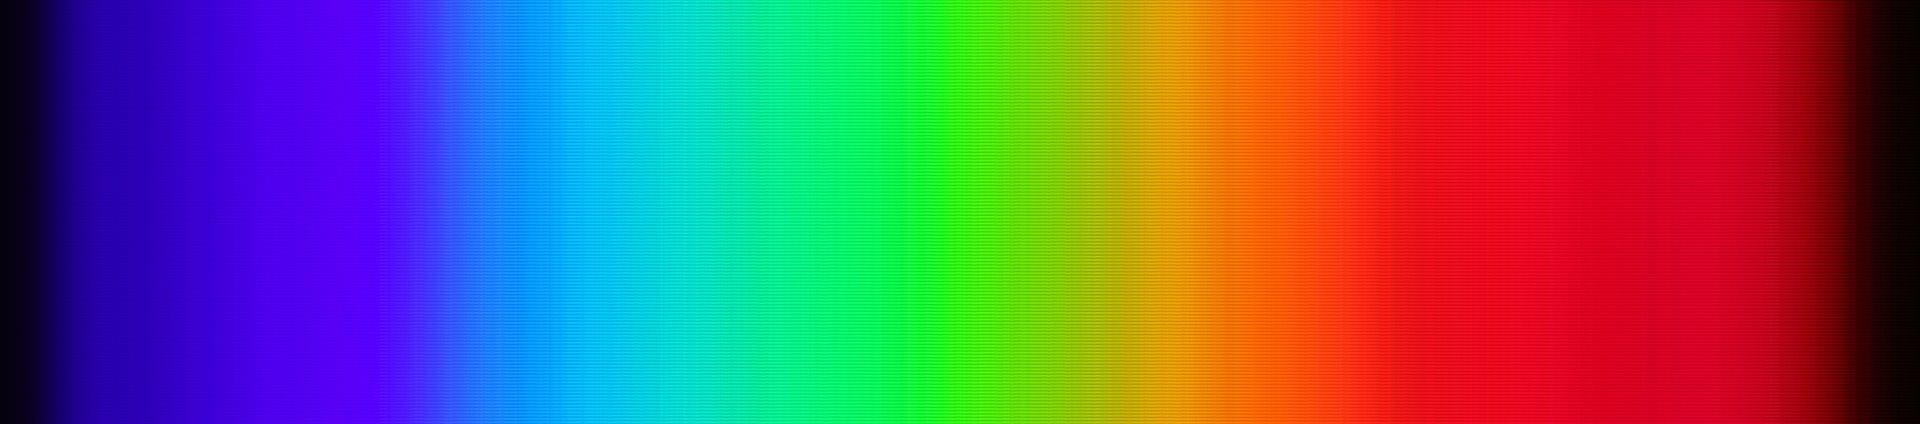 IMG_8261_Jupiter_Spektrum_breit.jpg